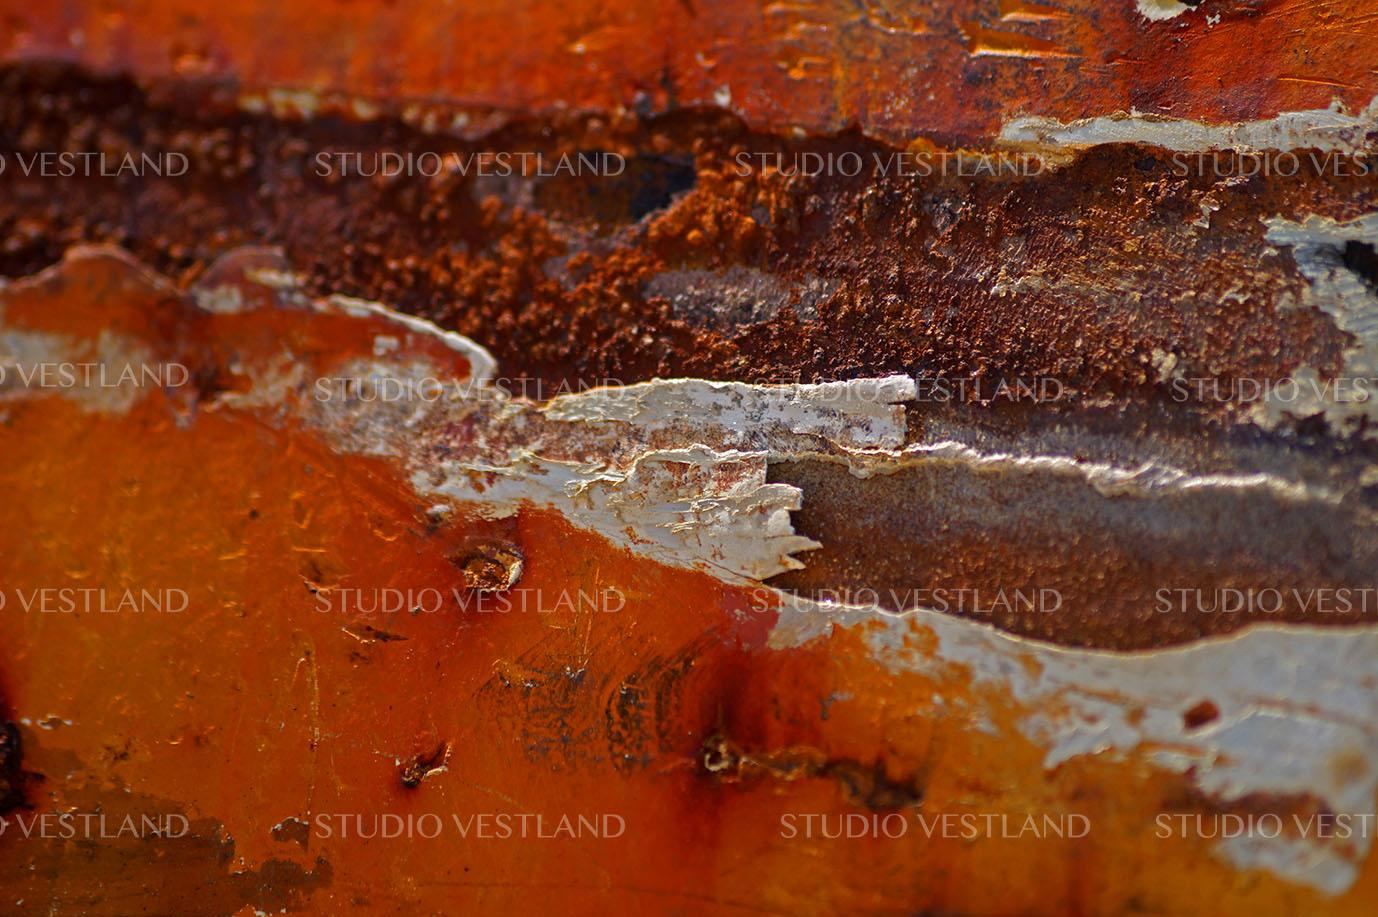 Studio Vestland - Sprekk 09